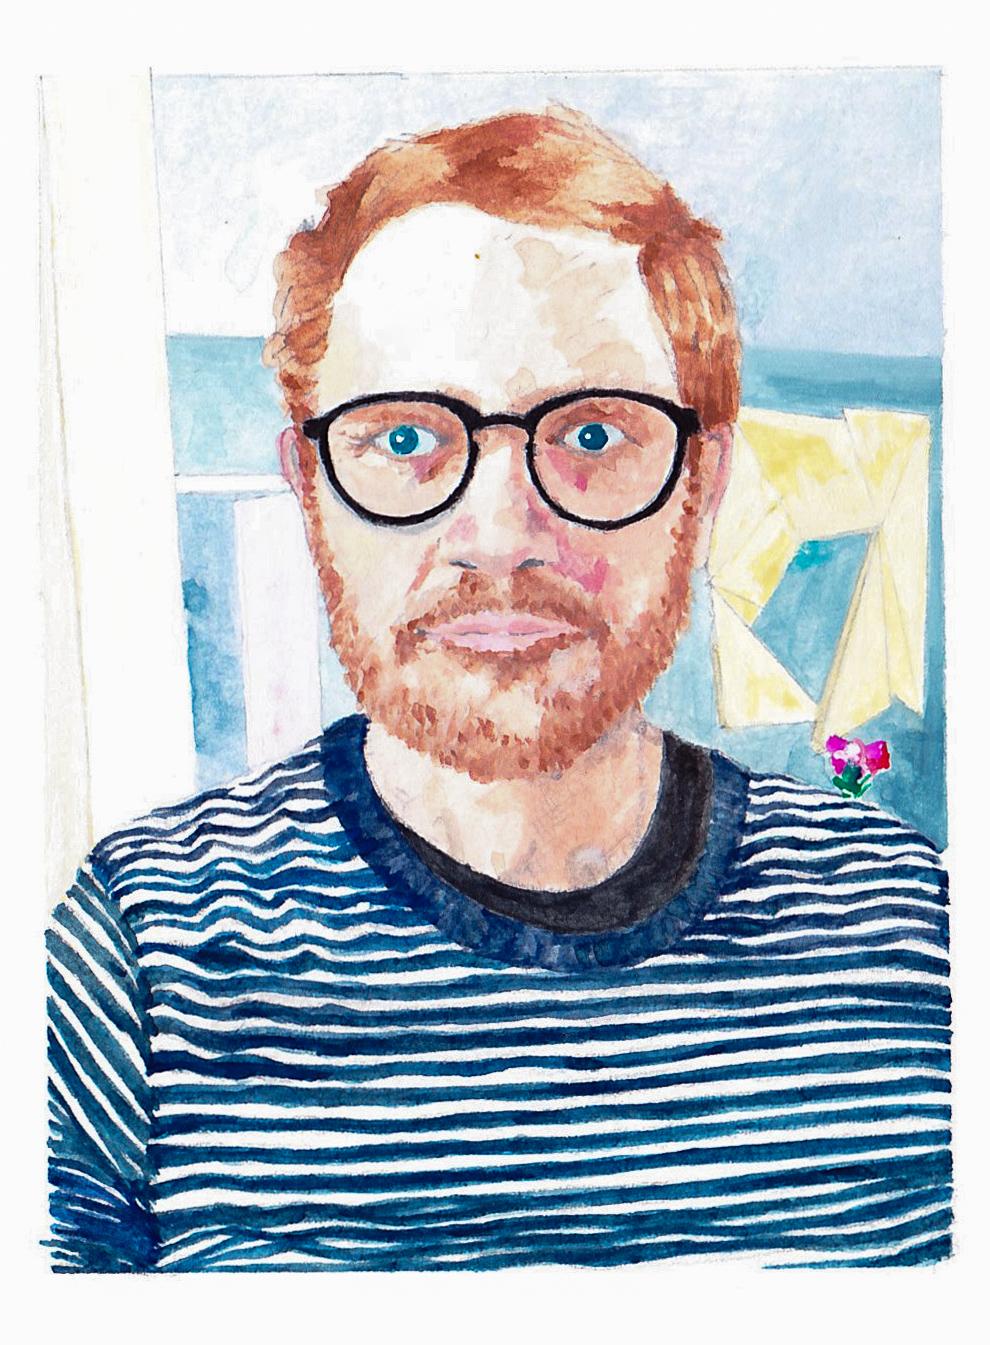 A self-portrait of Robert.